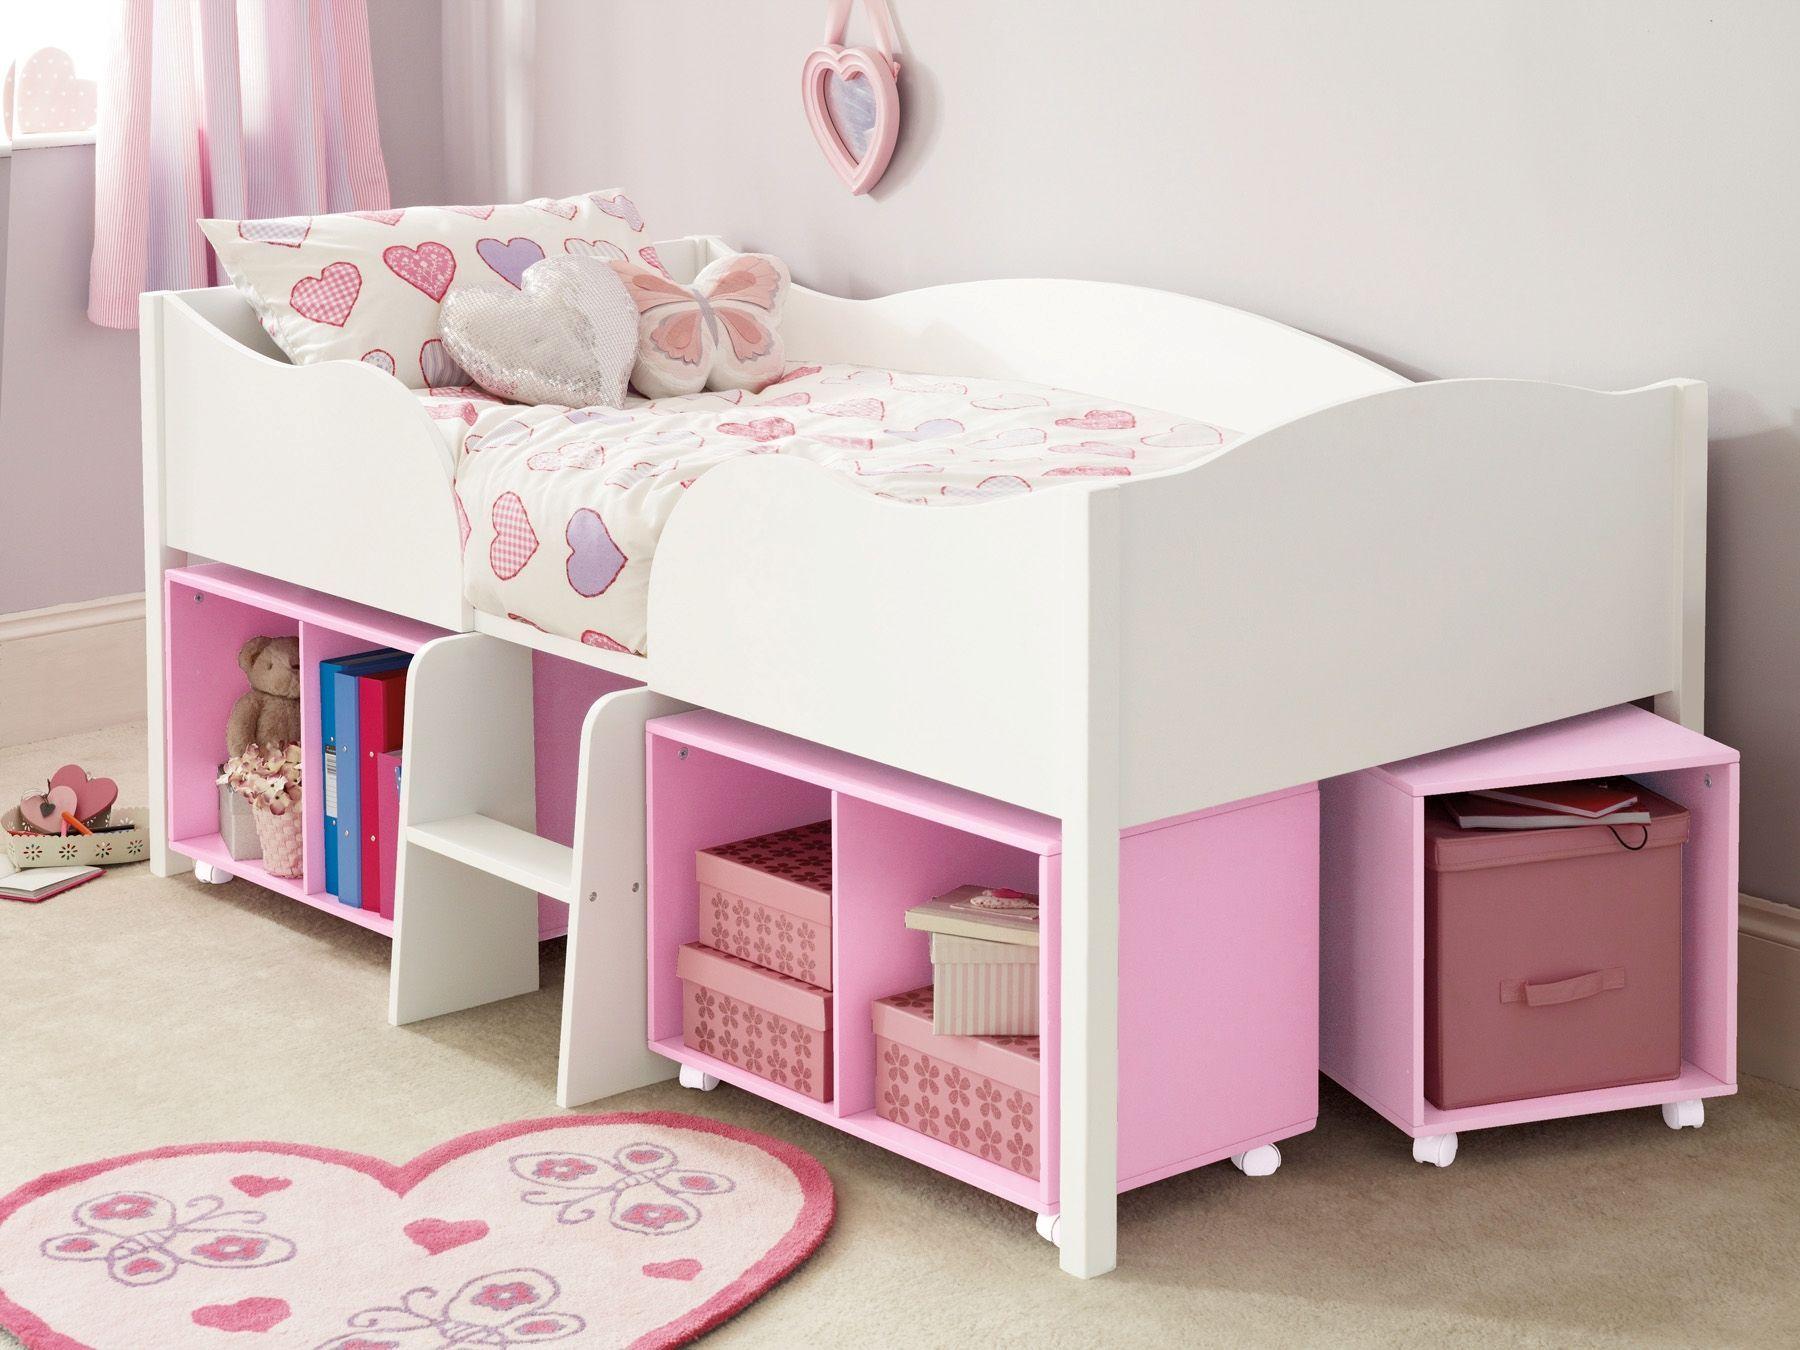 Buy Cabin Bed From The Next Uk Online Shop Childrens Bedrooms Design Childrens Bedrooms Girls Bedroom Furniture